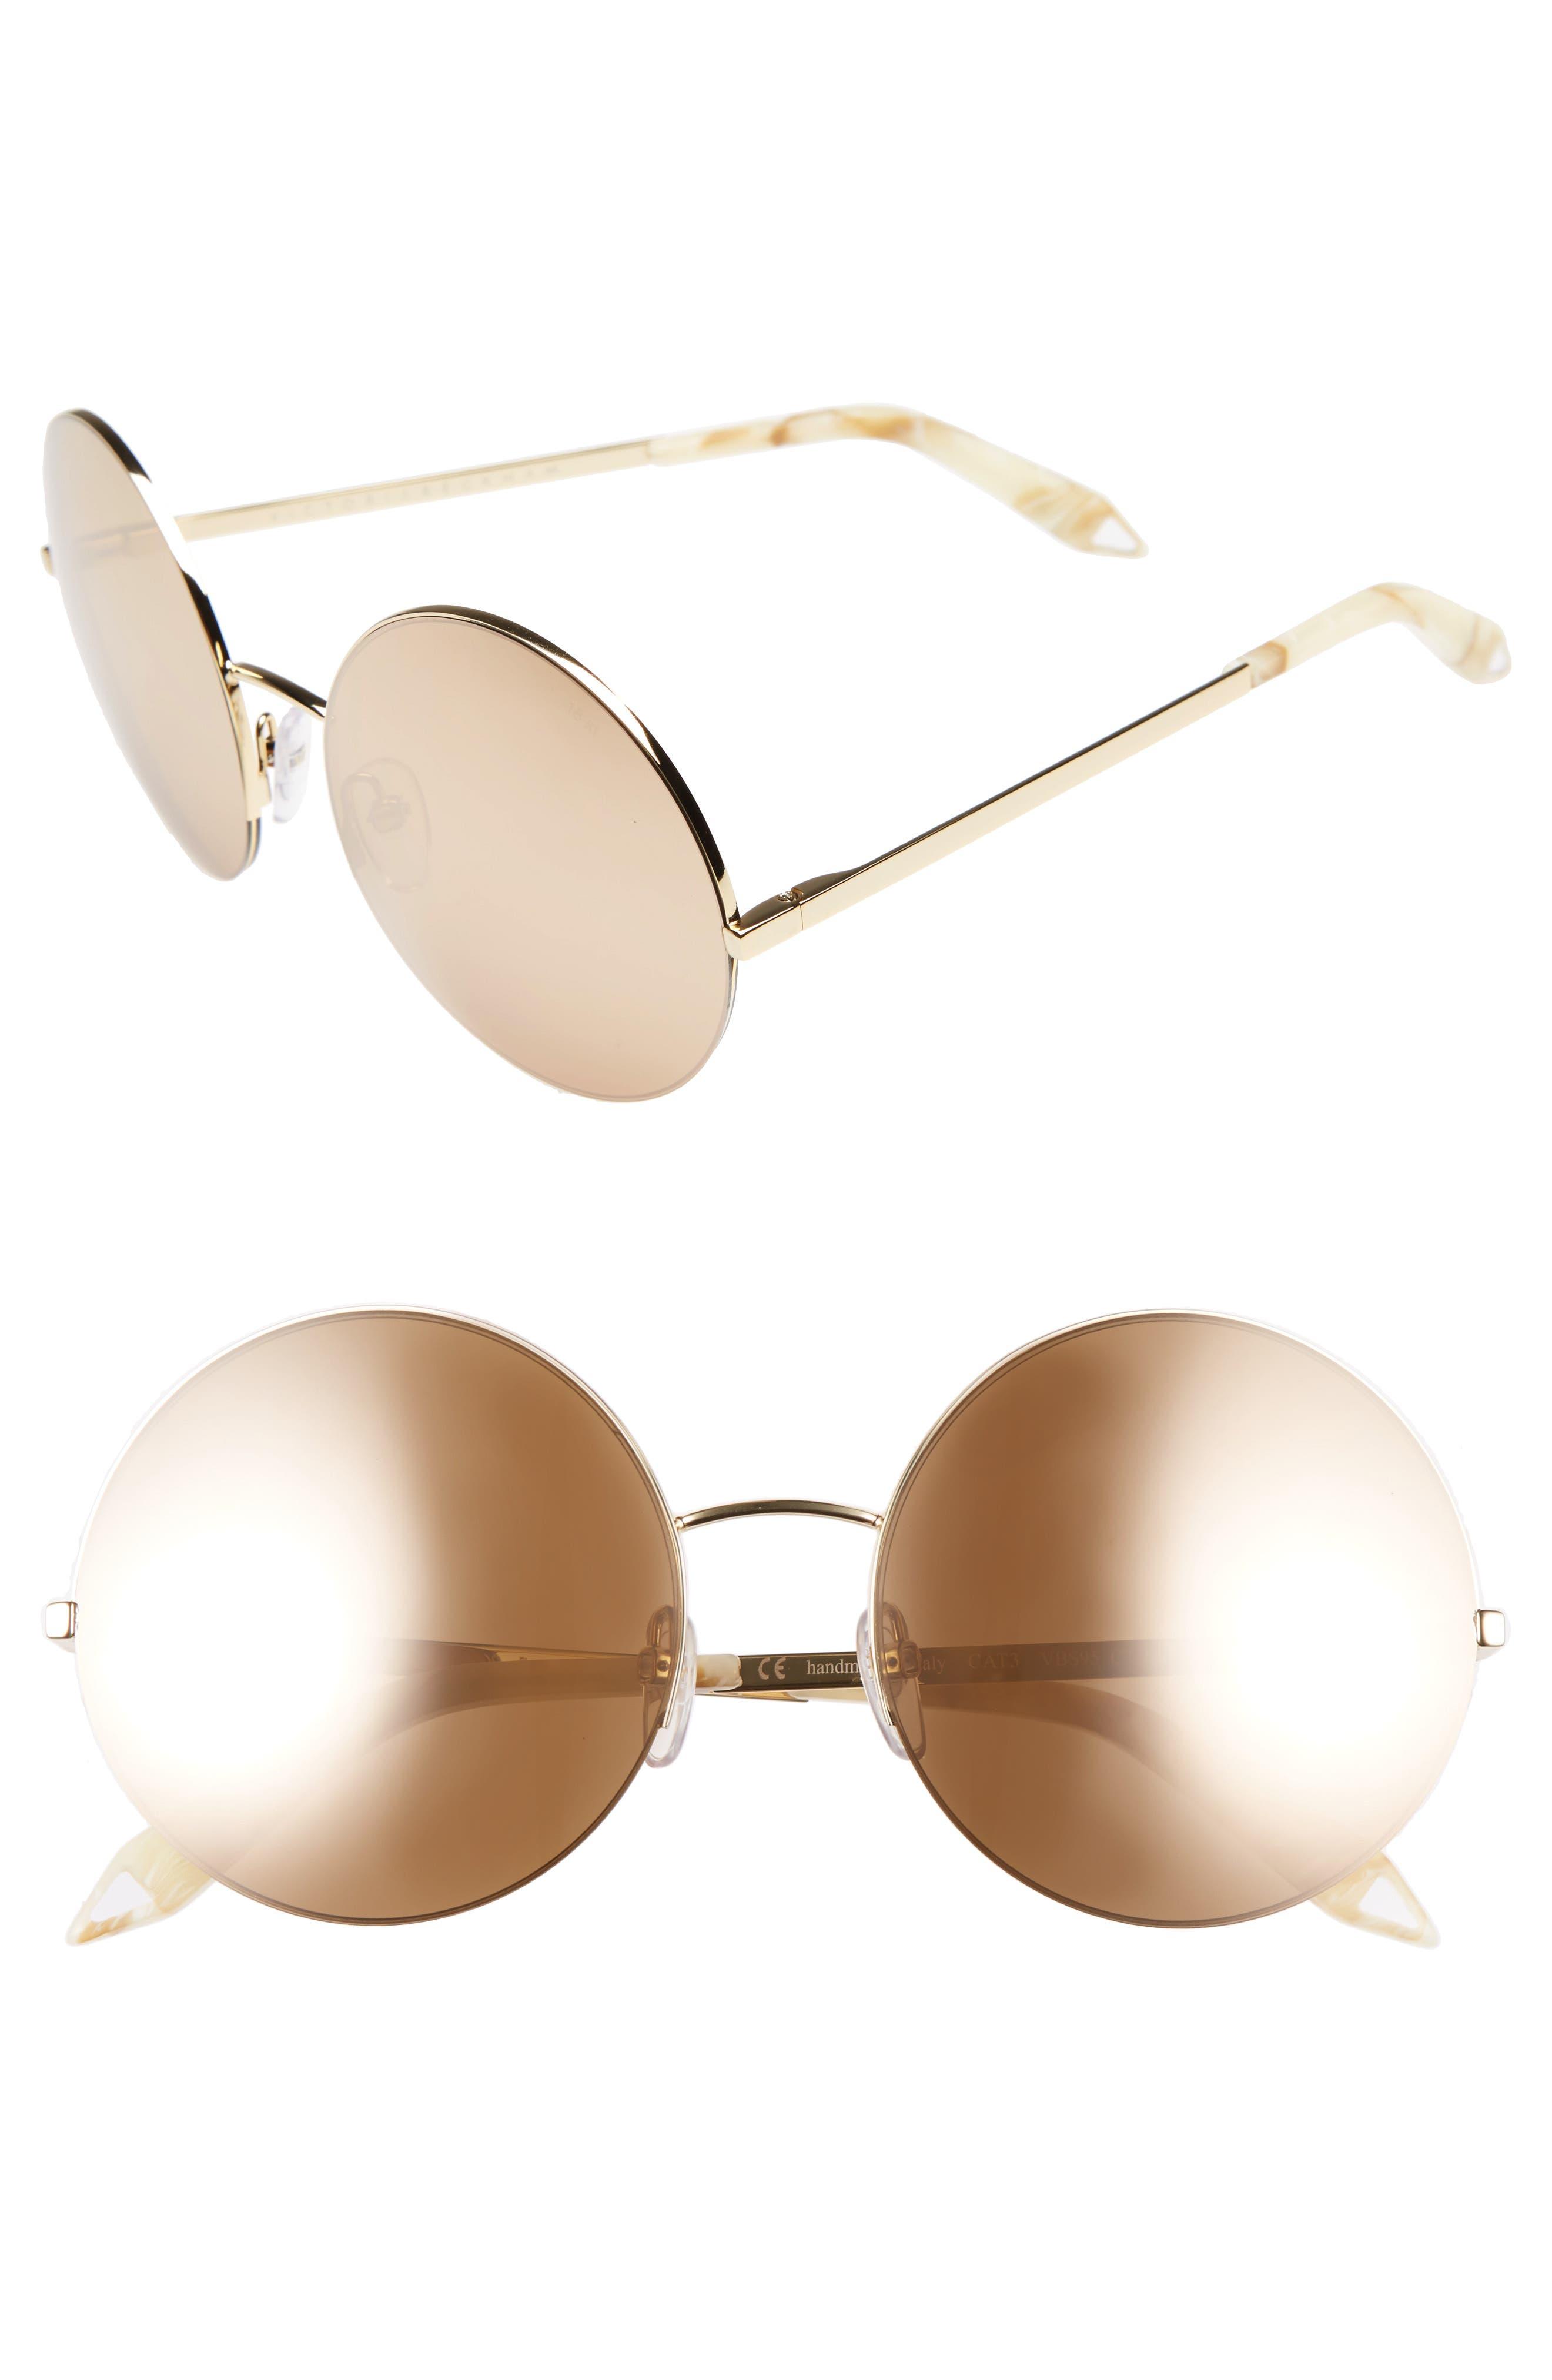 VICTORIA BECKHAM, 56mm Round Sunglasses, Alternate thumbnail 2, color, GOLD METALLIC/ GOLD MIRROR